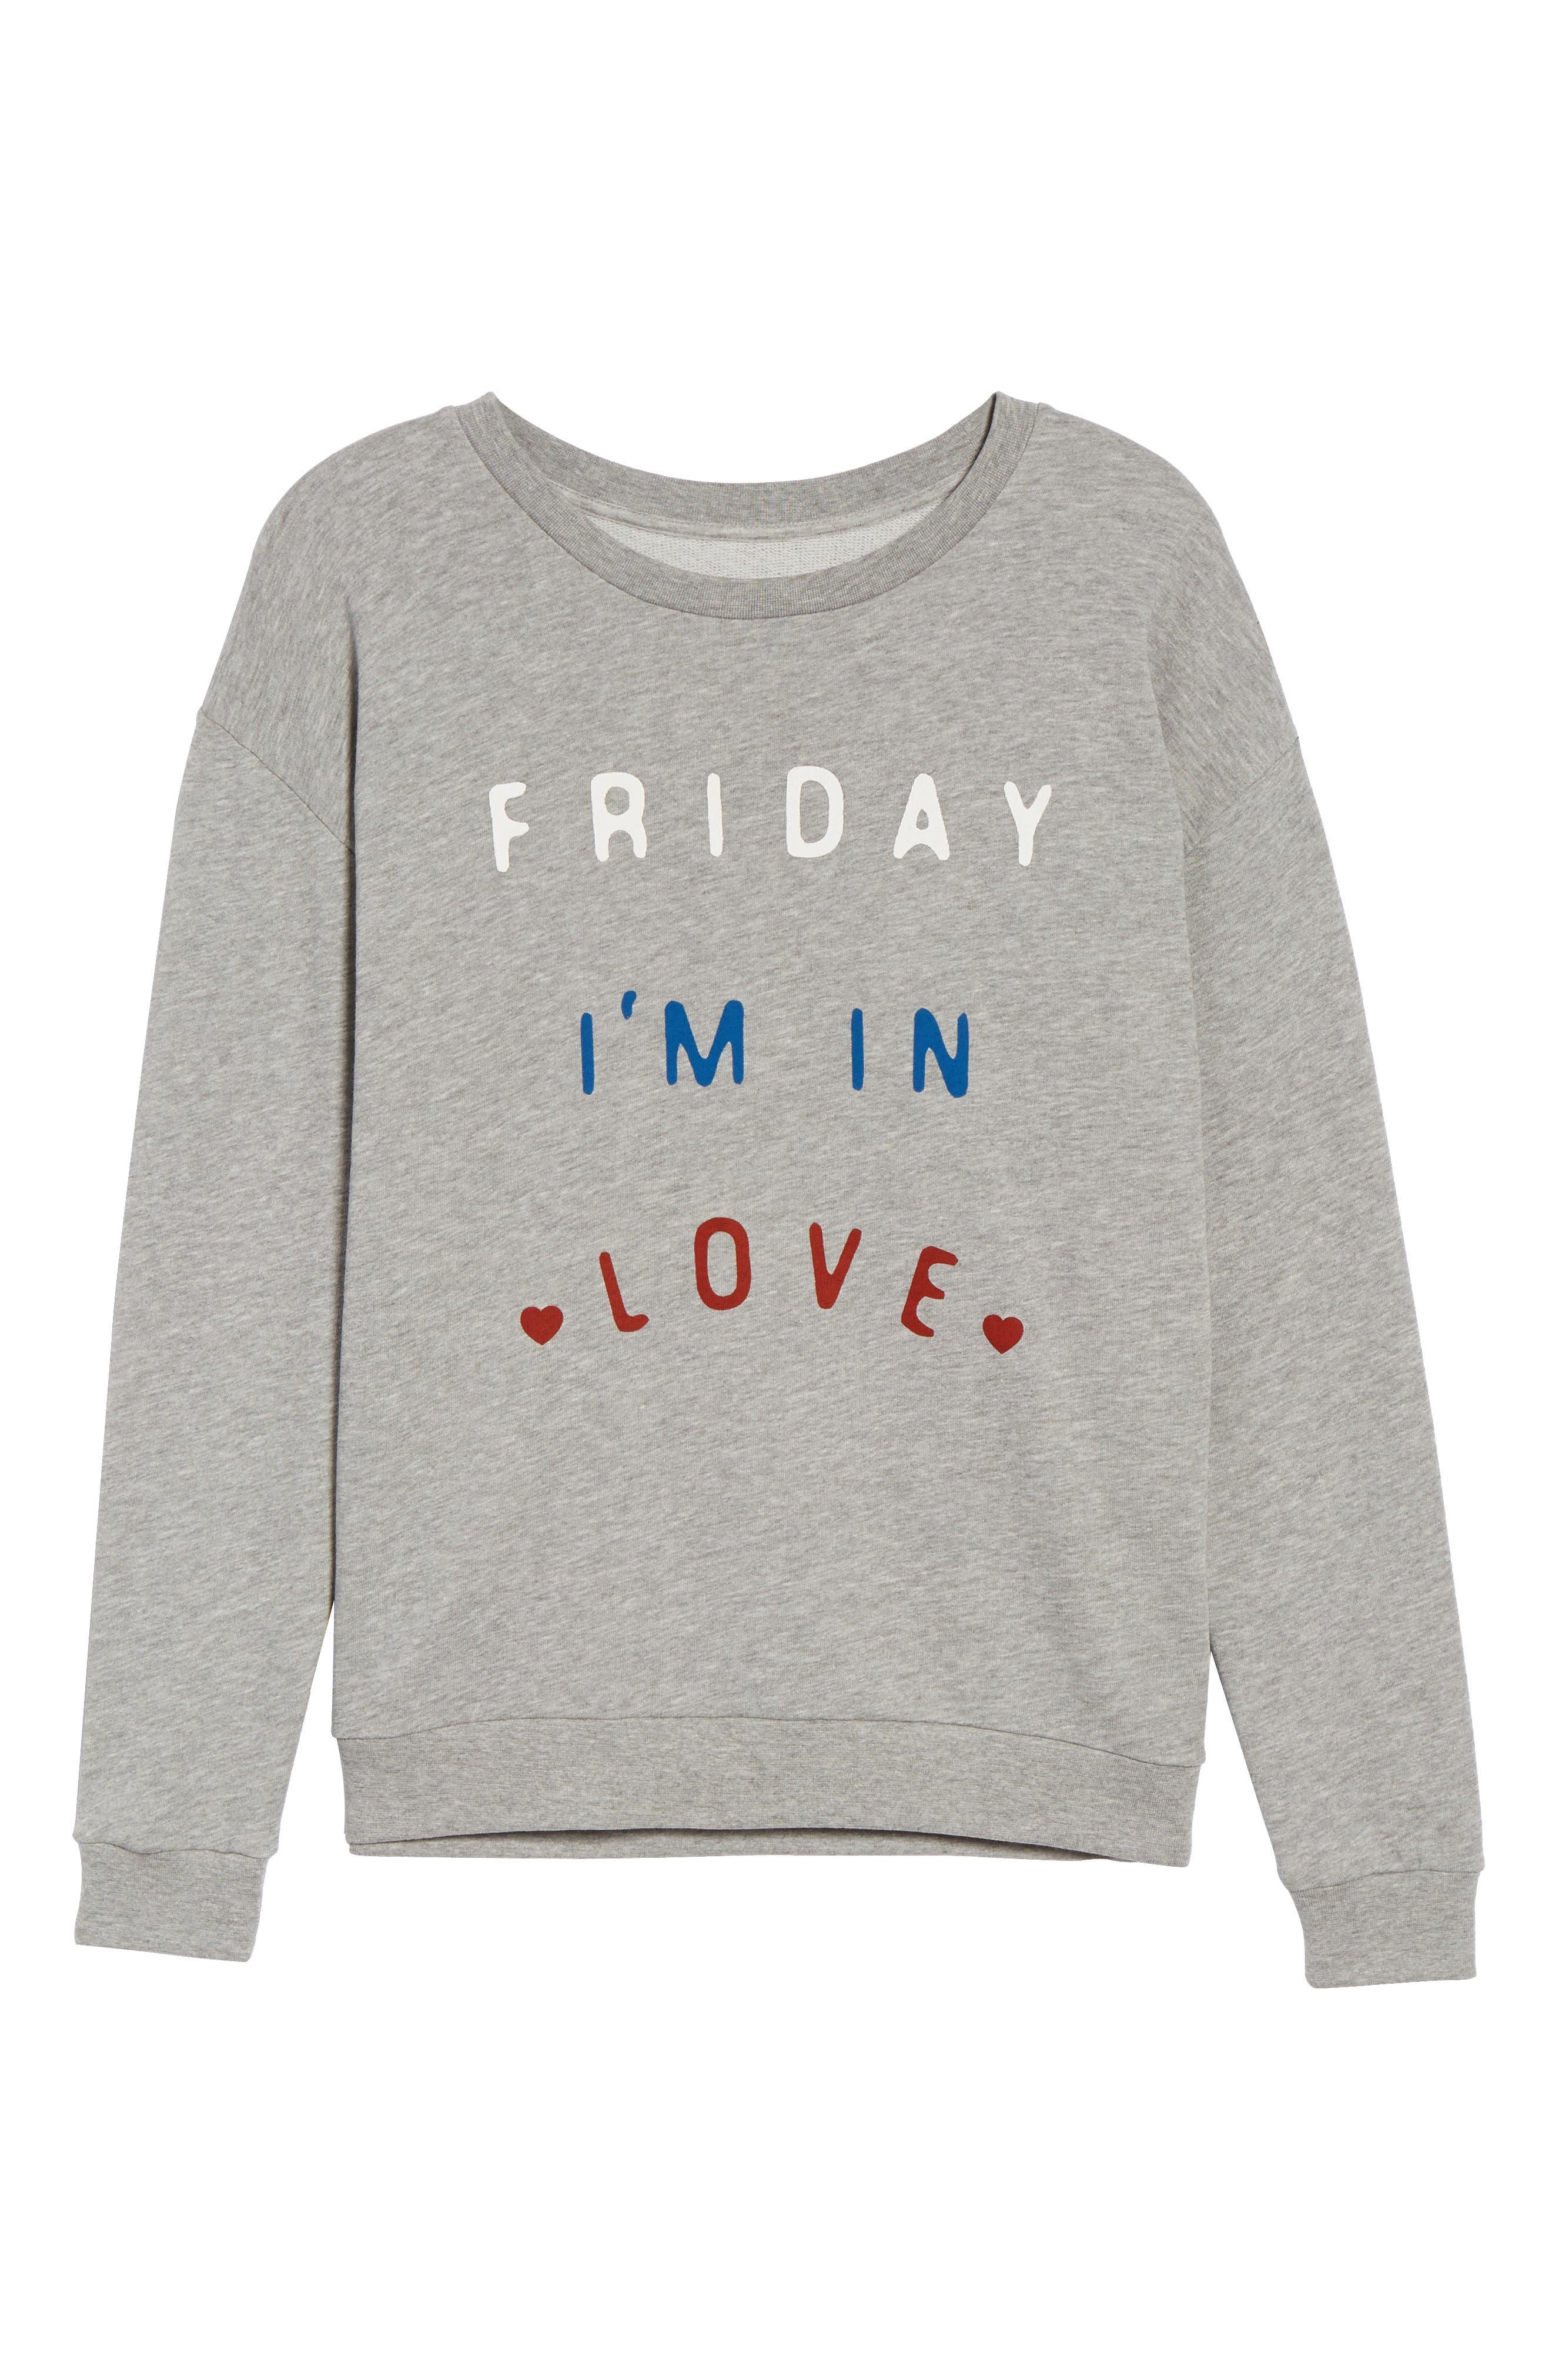 Friday I'm In Love Sweatshirt,                             Alternate thumbnail 6, color,                             020